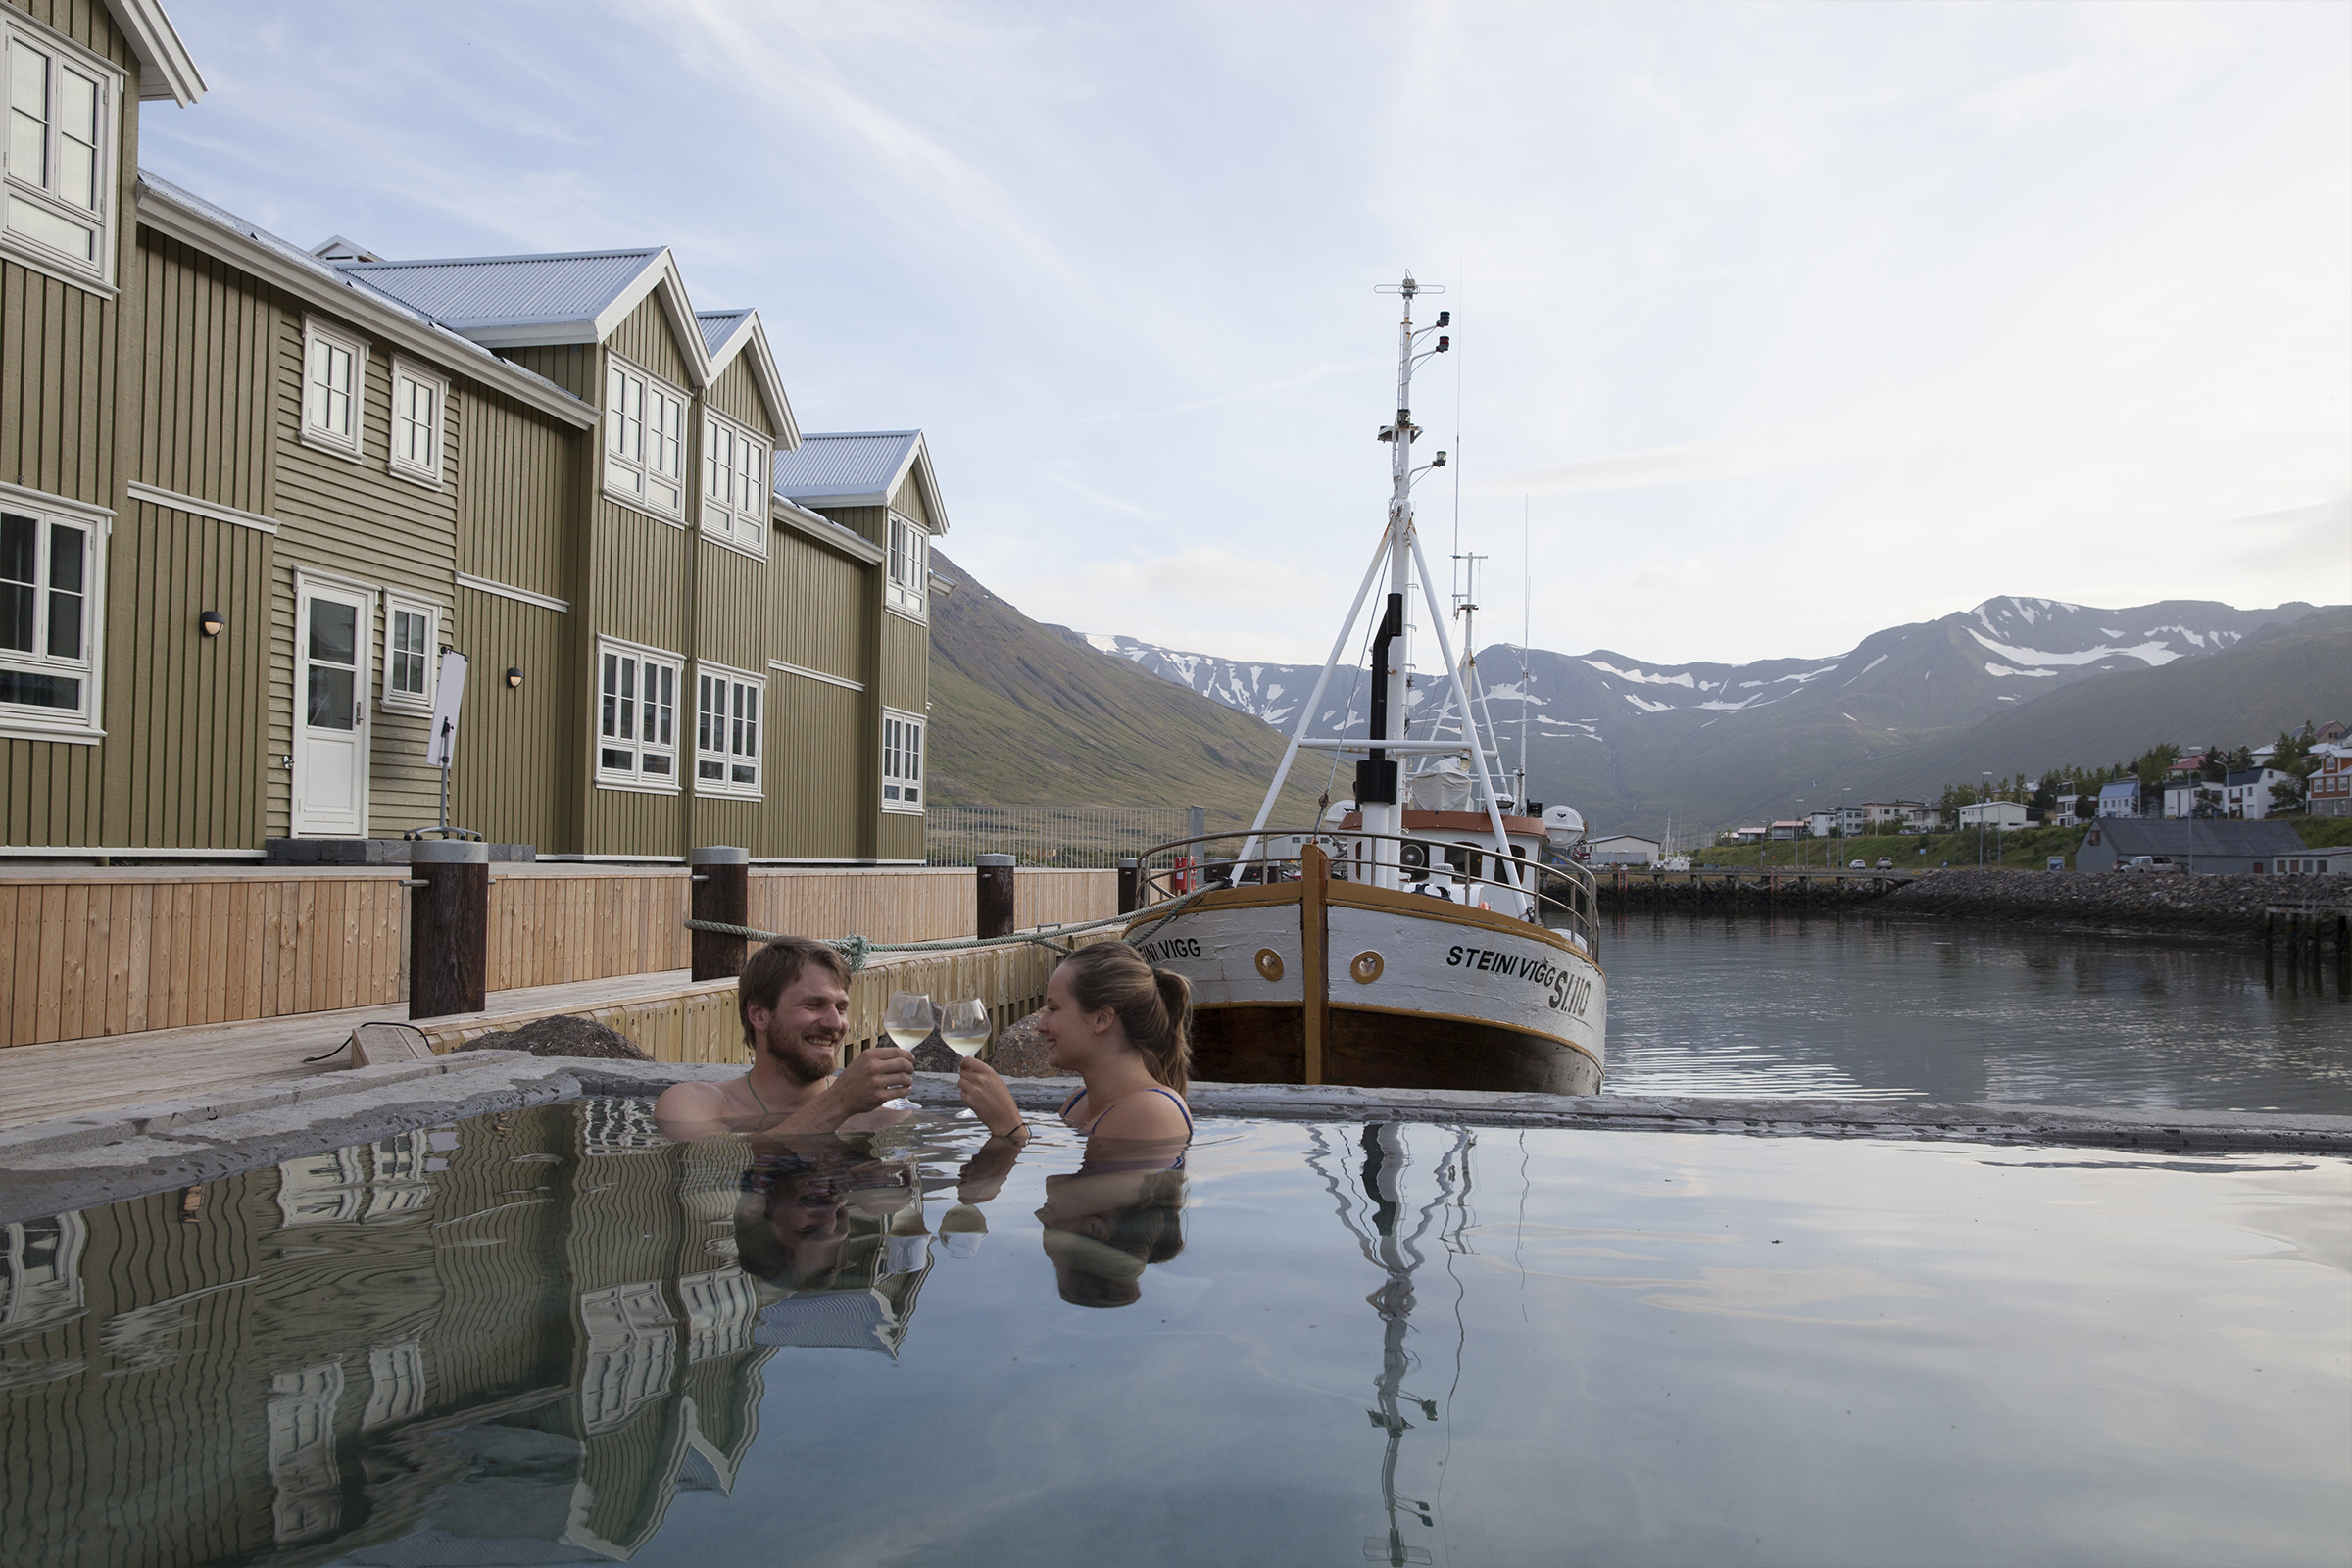 Hotel Sligo in Iceland